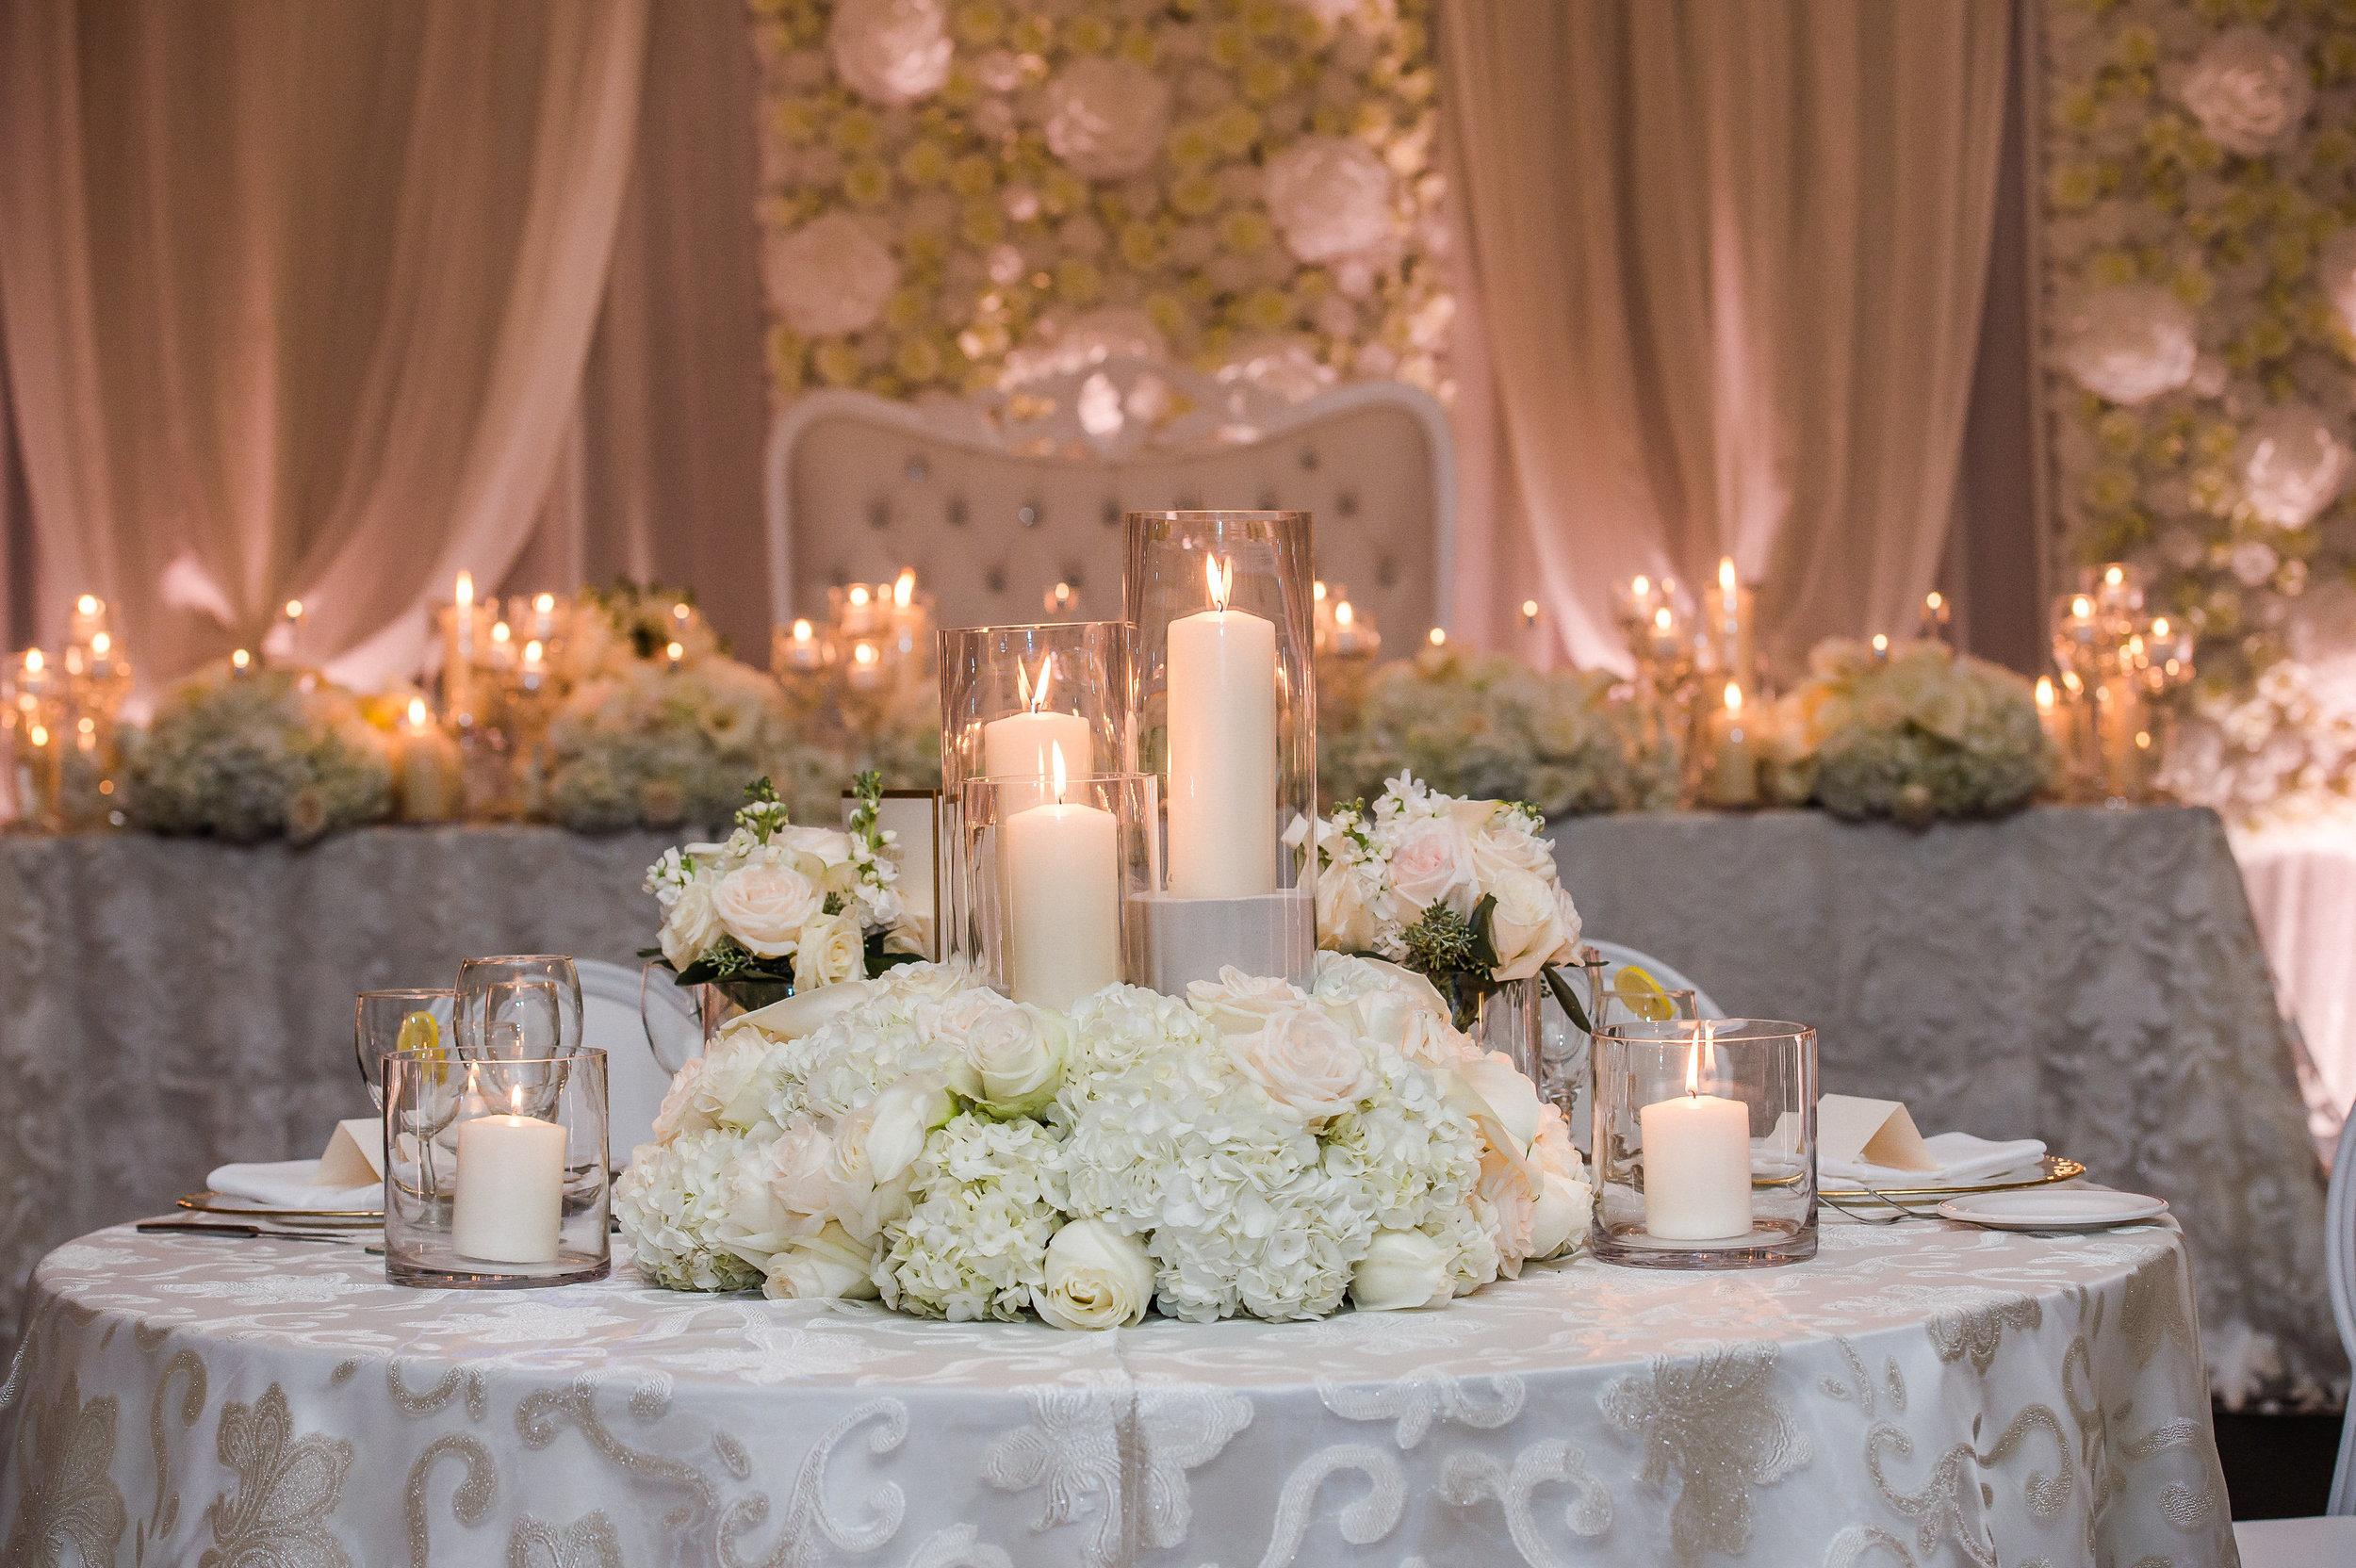 Chantelle Justin的婚礼-0323.jpg